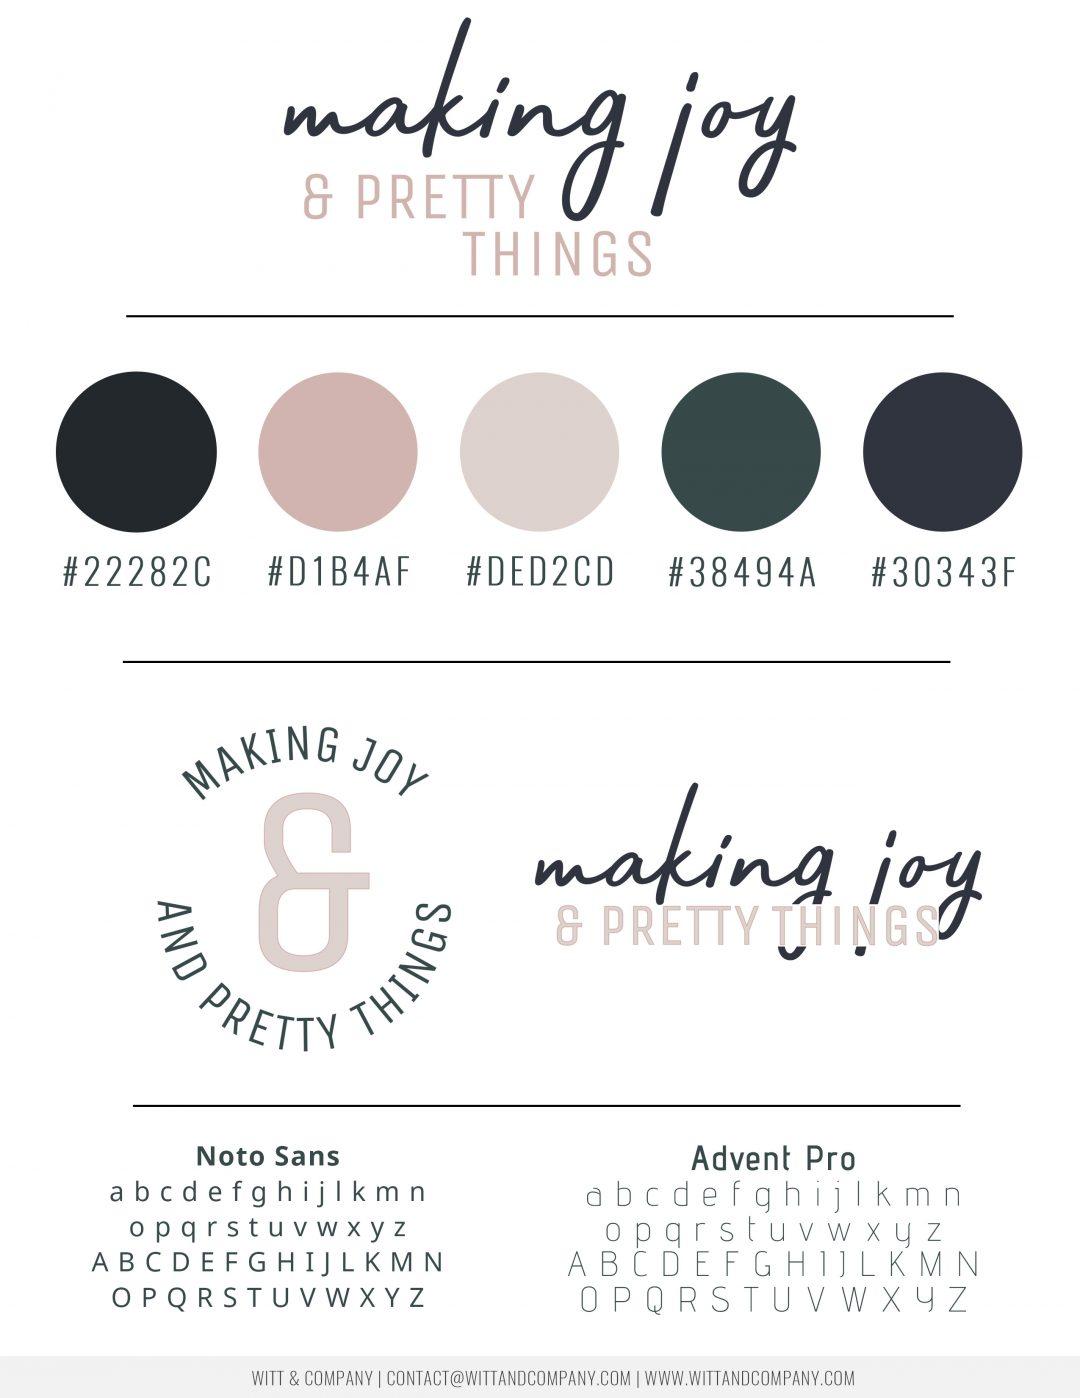 Making Joy and Pretty Things | Branding